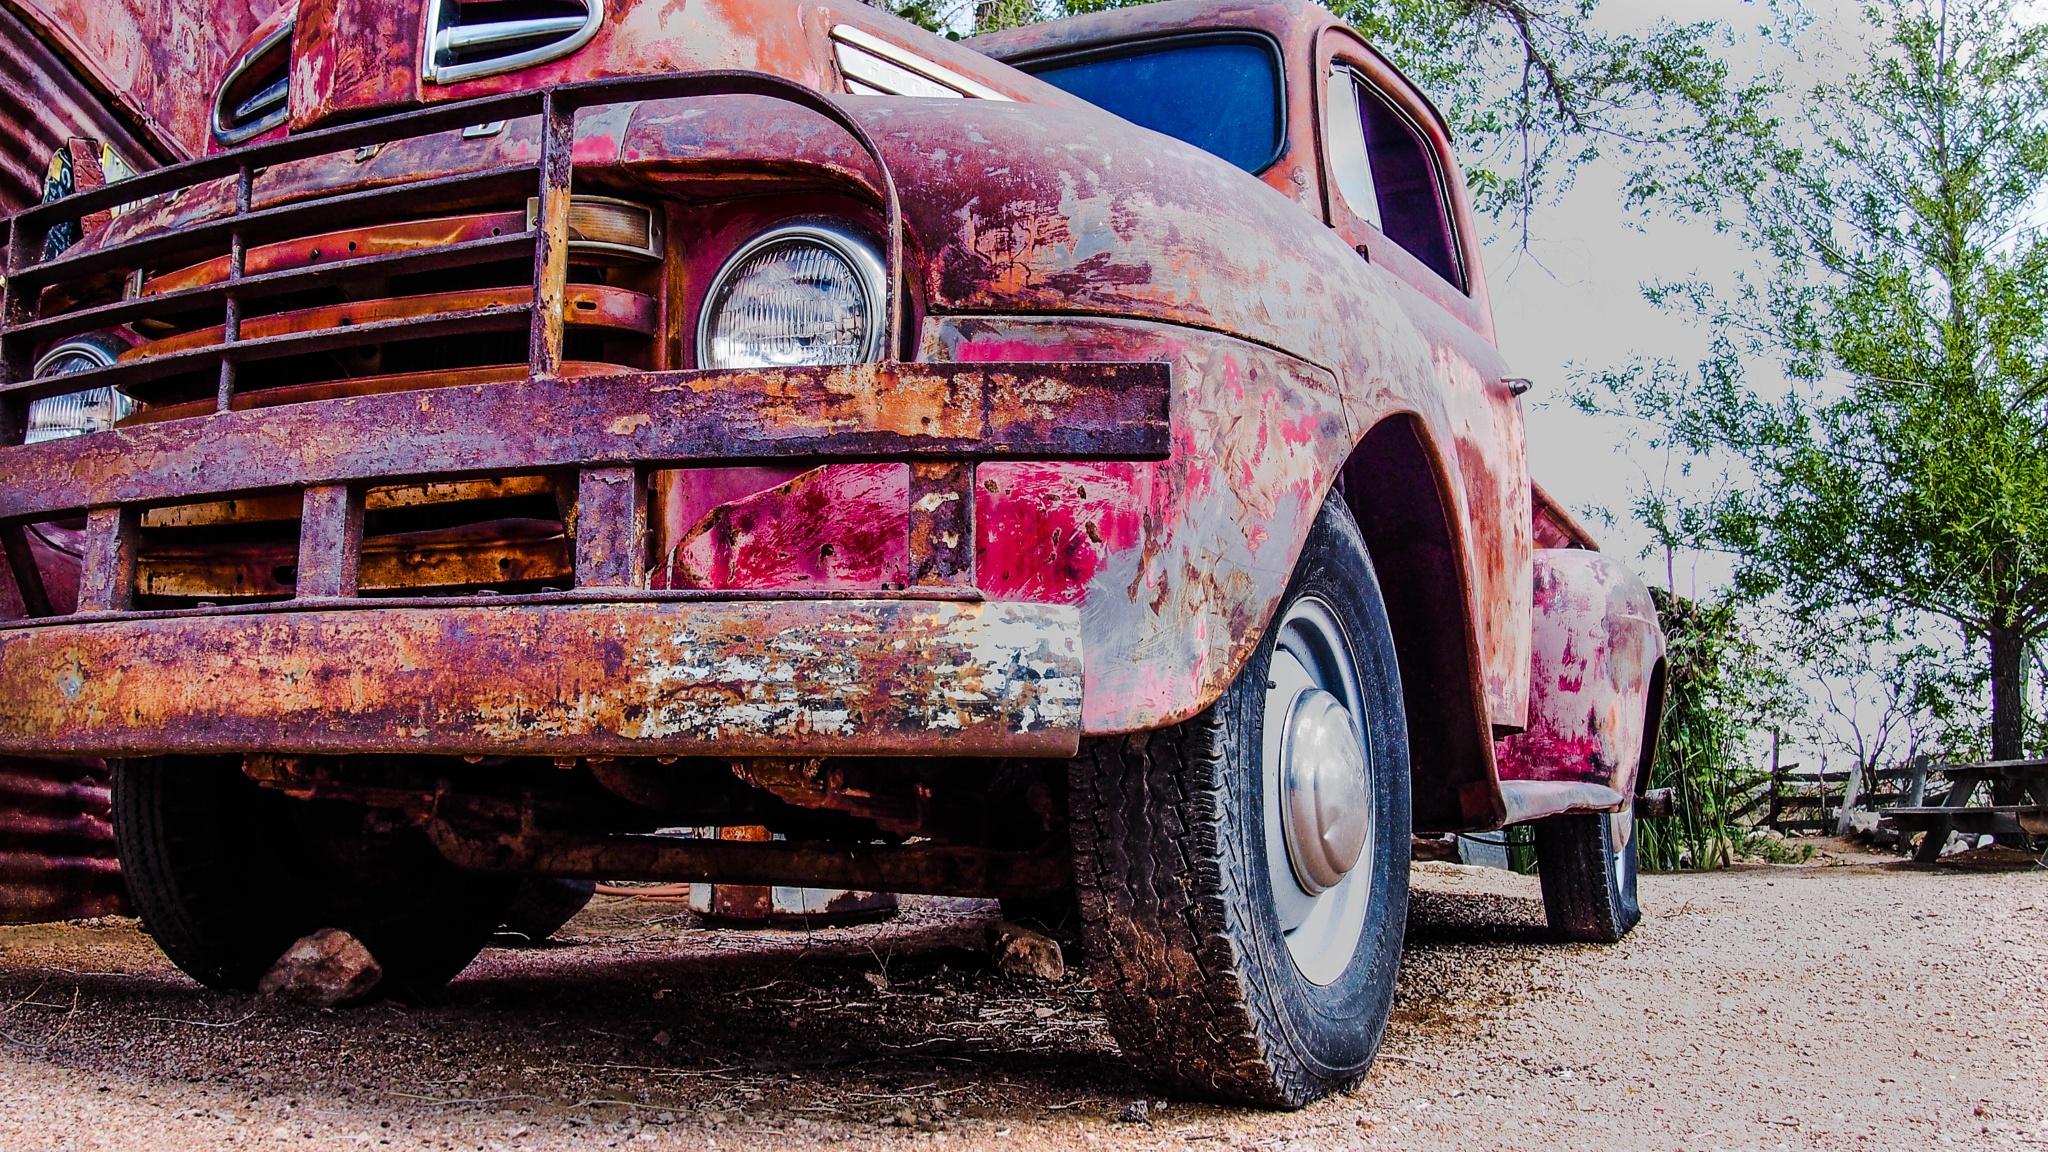 american truck by dannymoore1973